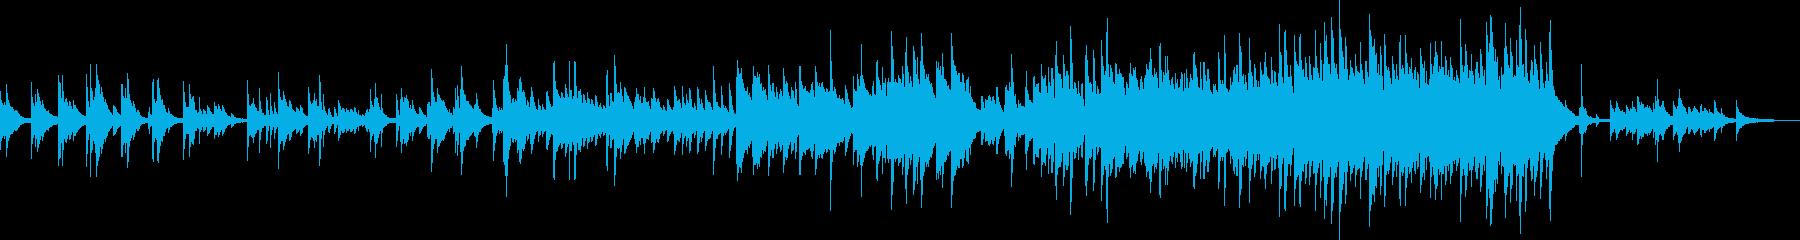 Goodbye, thank you (piano, sad)'s reproduced waveform